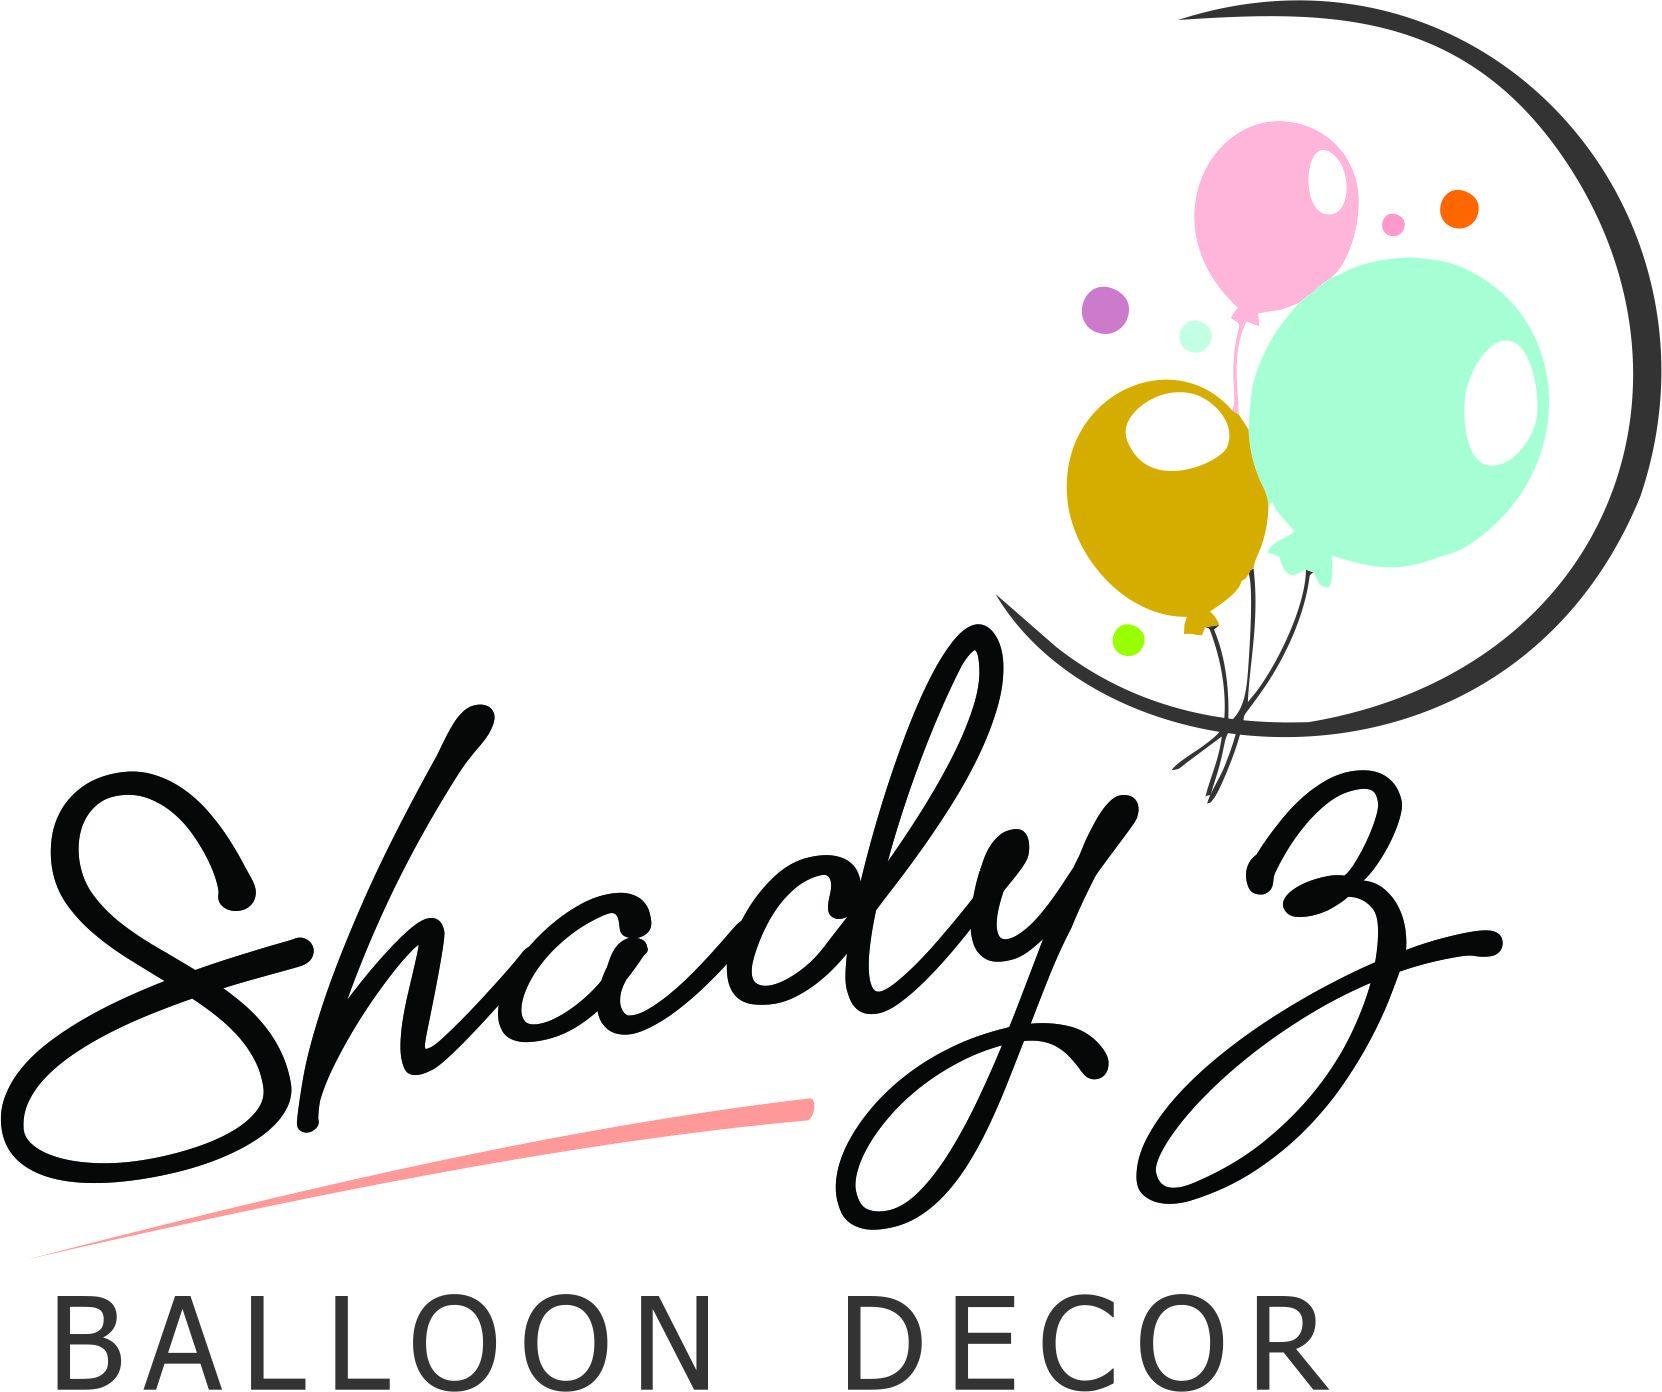 Shazy'z Balloon Decor and Gifts